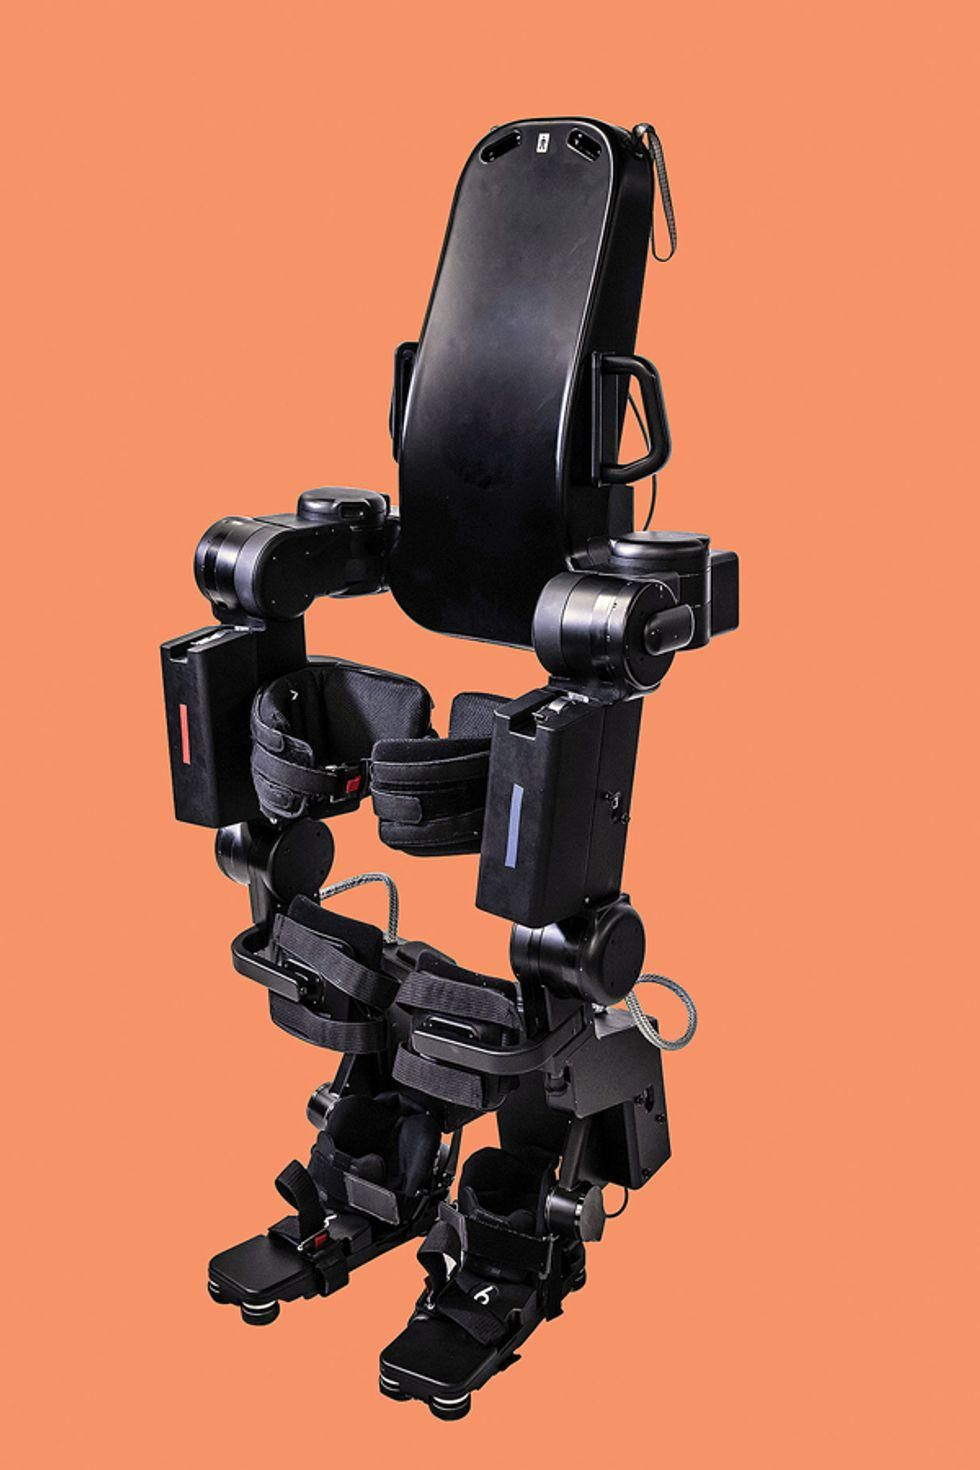 Caltech lower-body exoskeleton